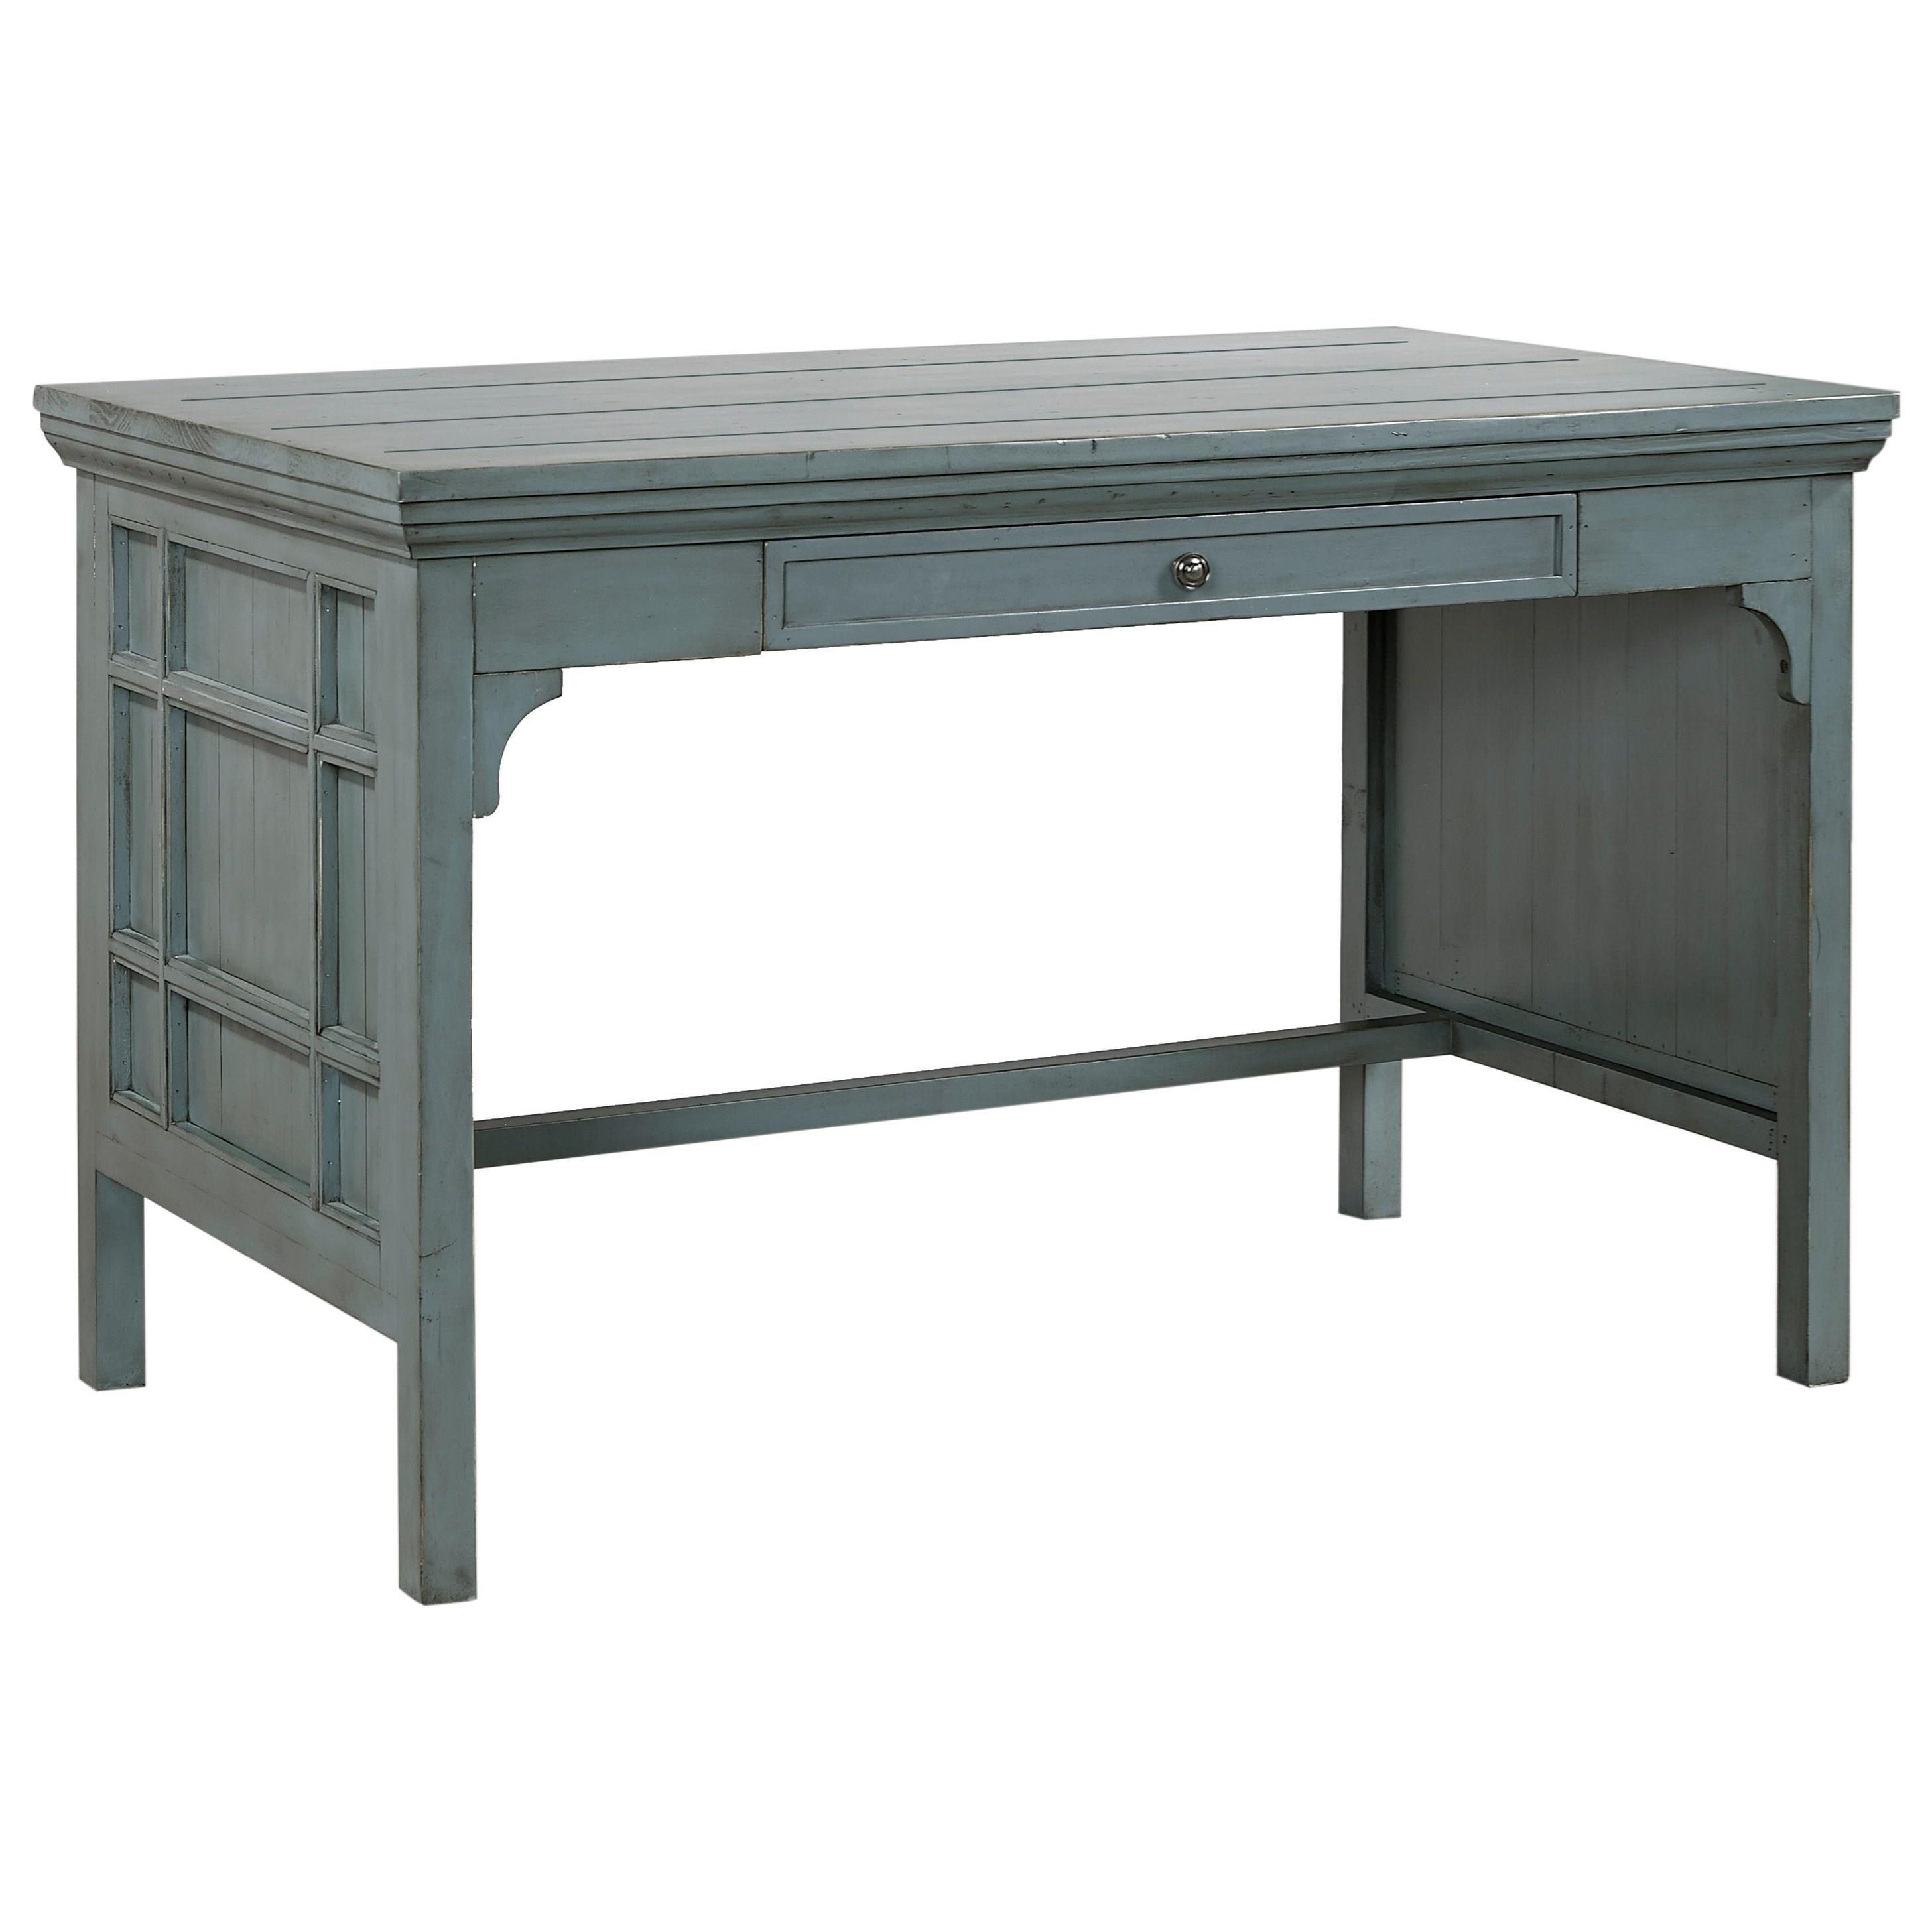 "Morris Home Furnishings Socorro Socorro 48"" Writing Desk - Item Number: I44-348WD-SBL"